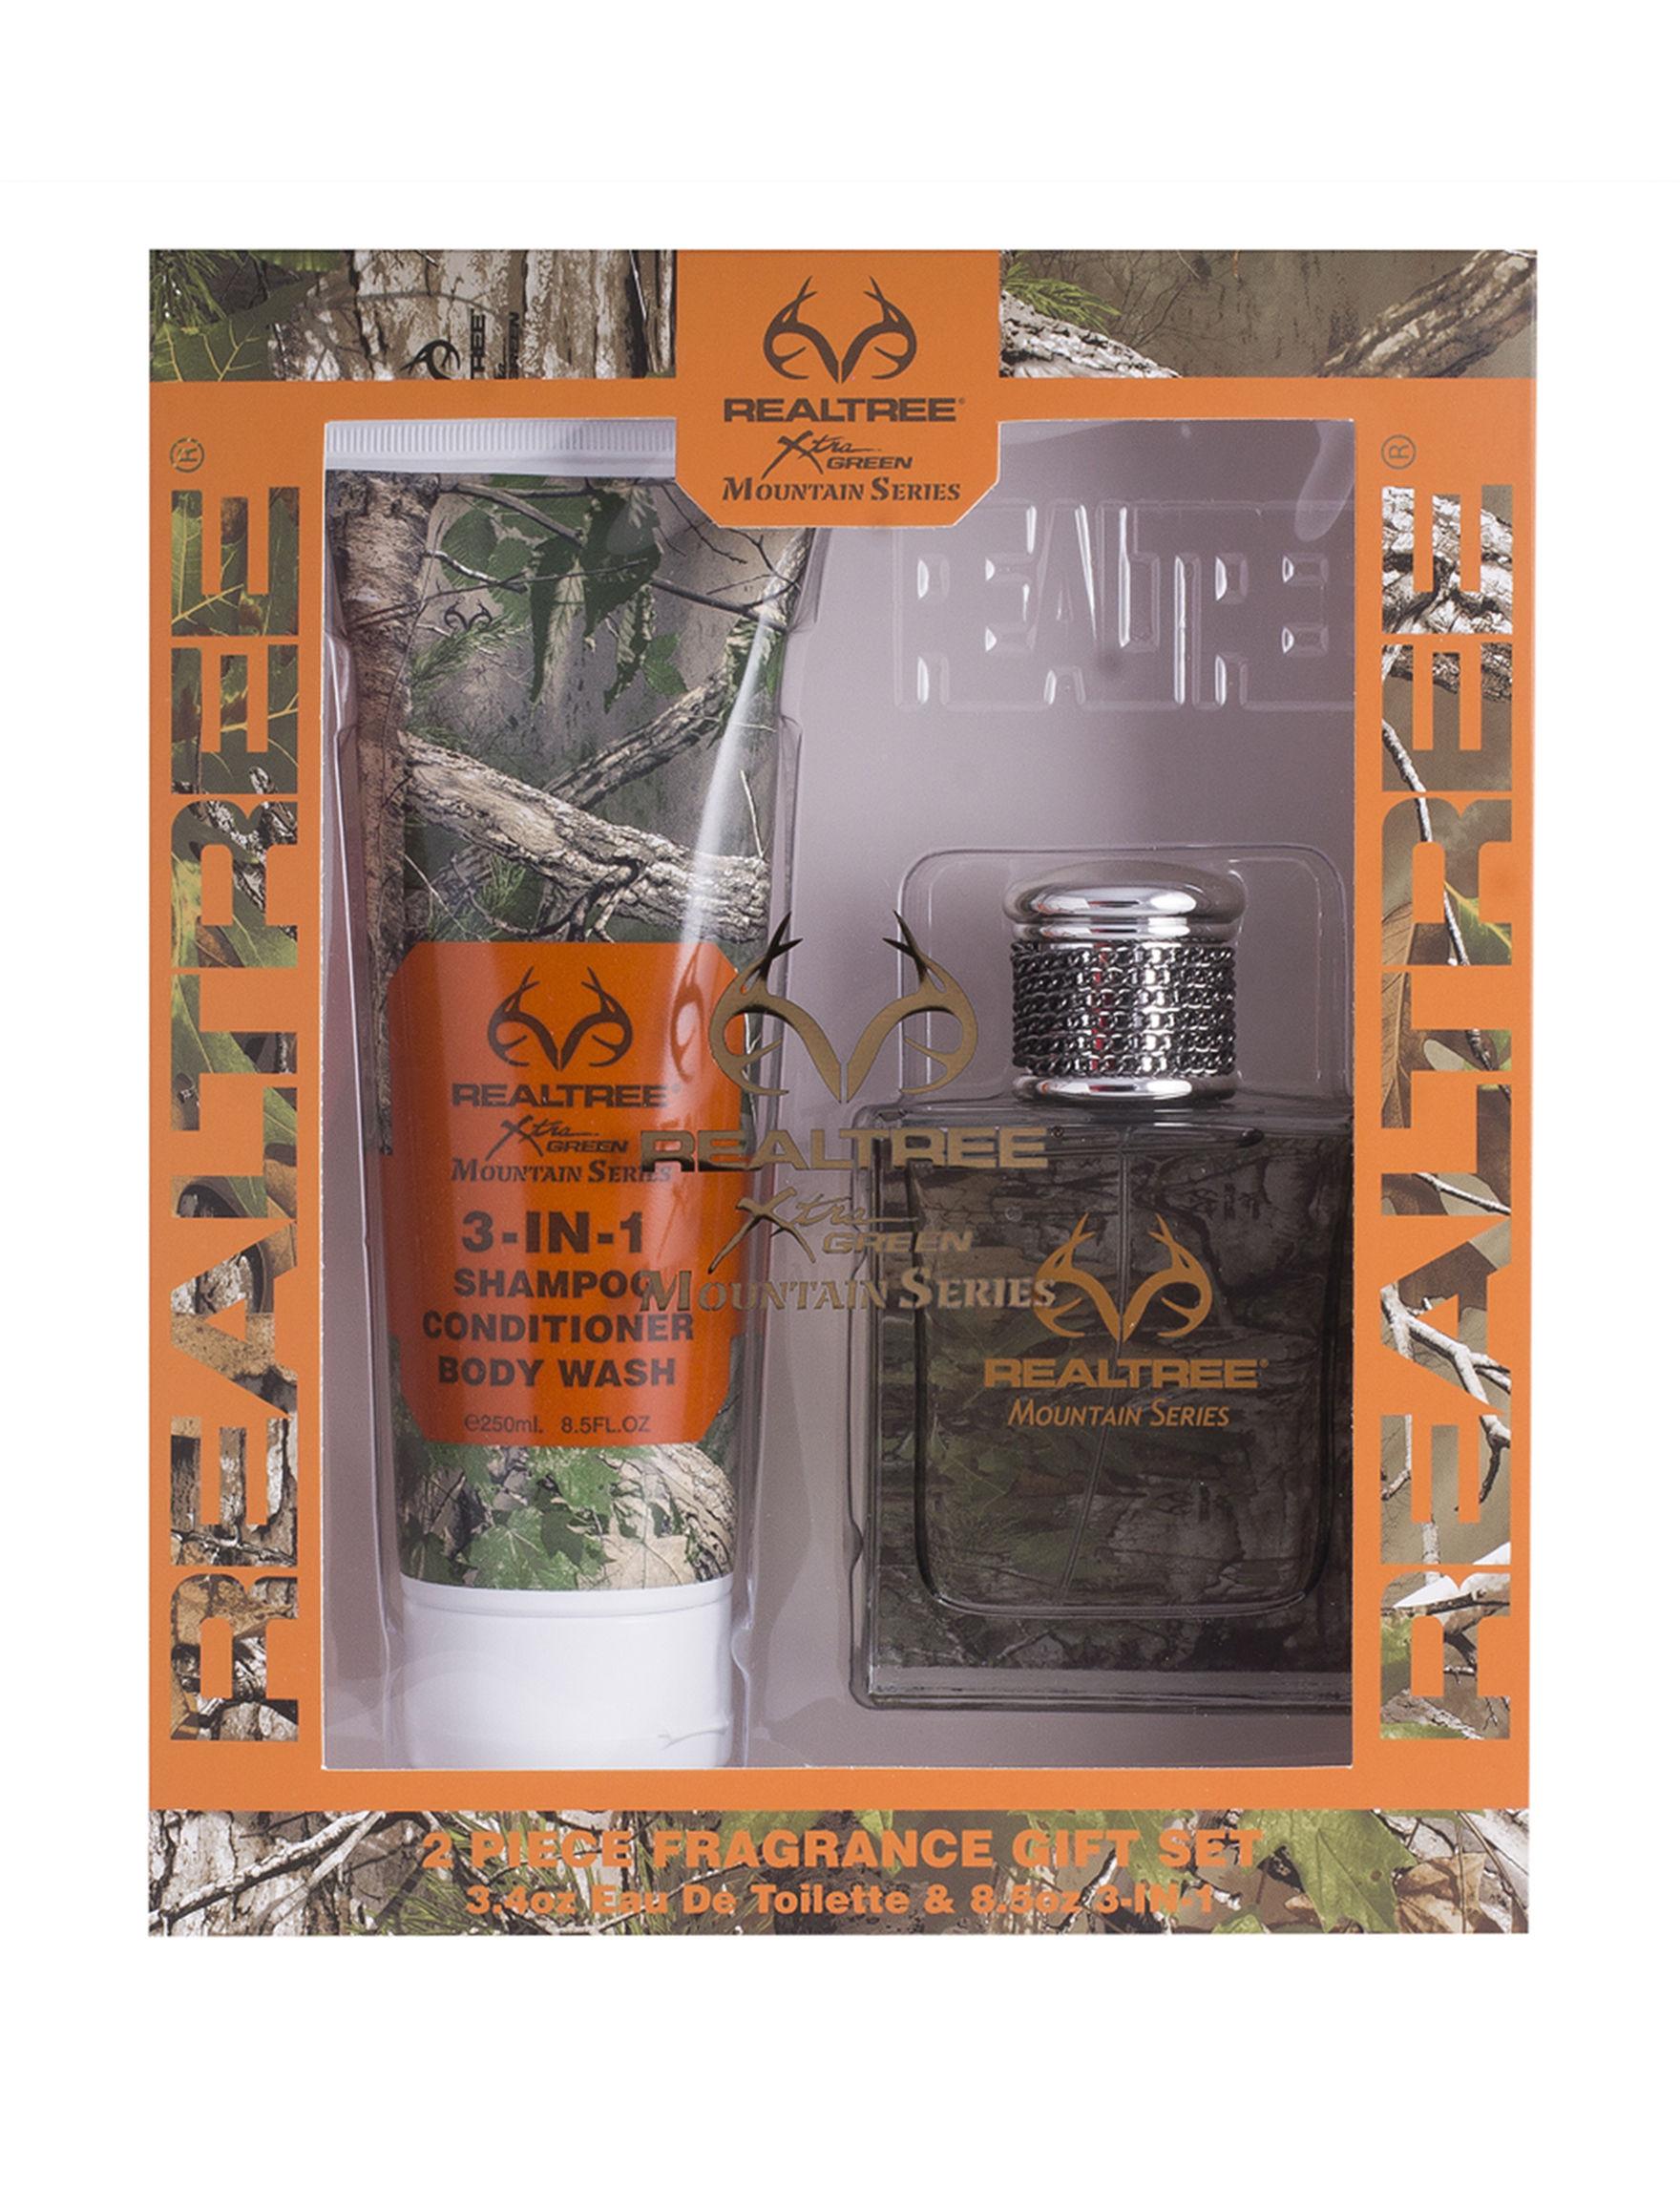 Realtree  Fragrance Gift Sets